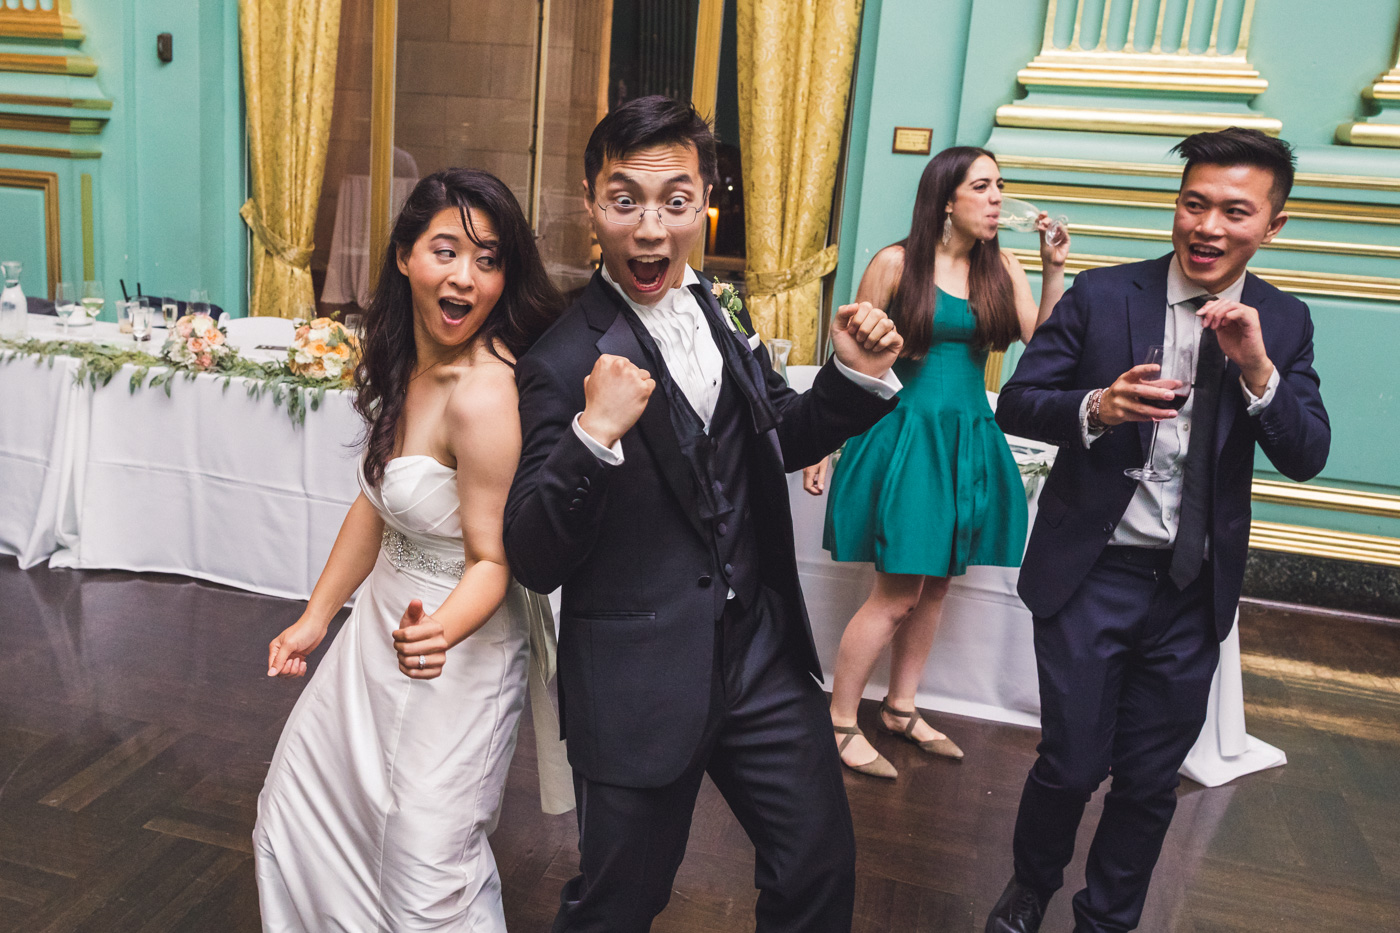 green-room-sf-wedding-reception-dancing